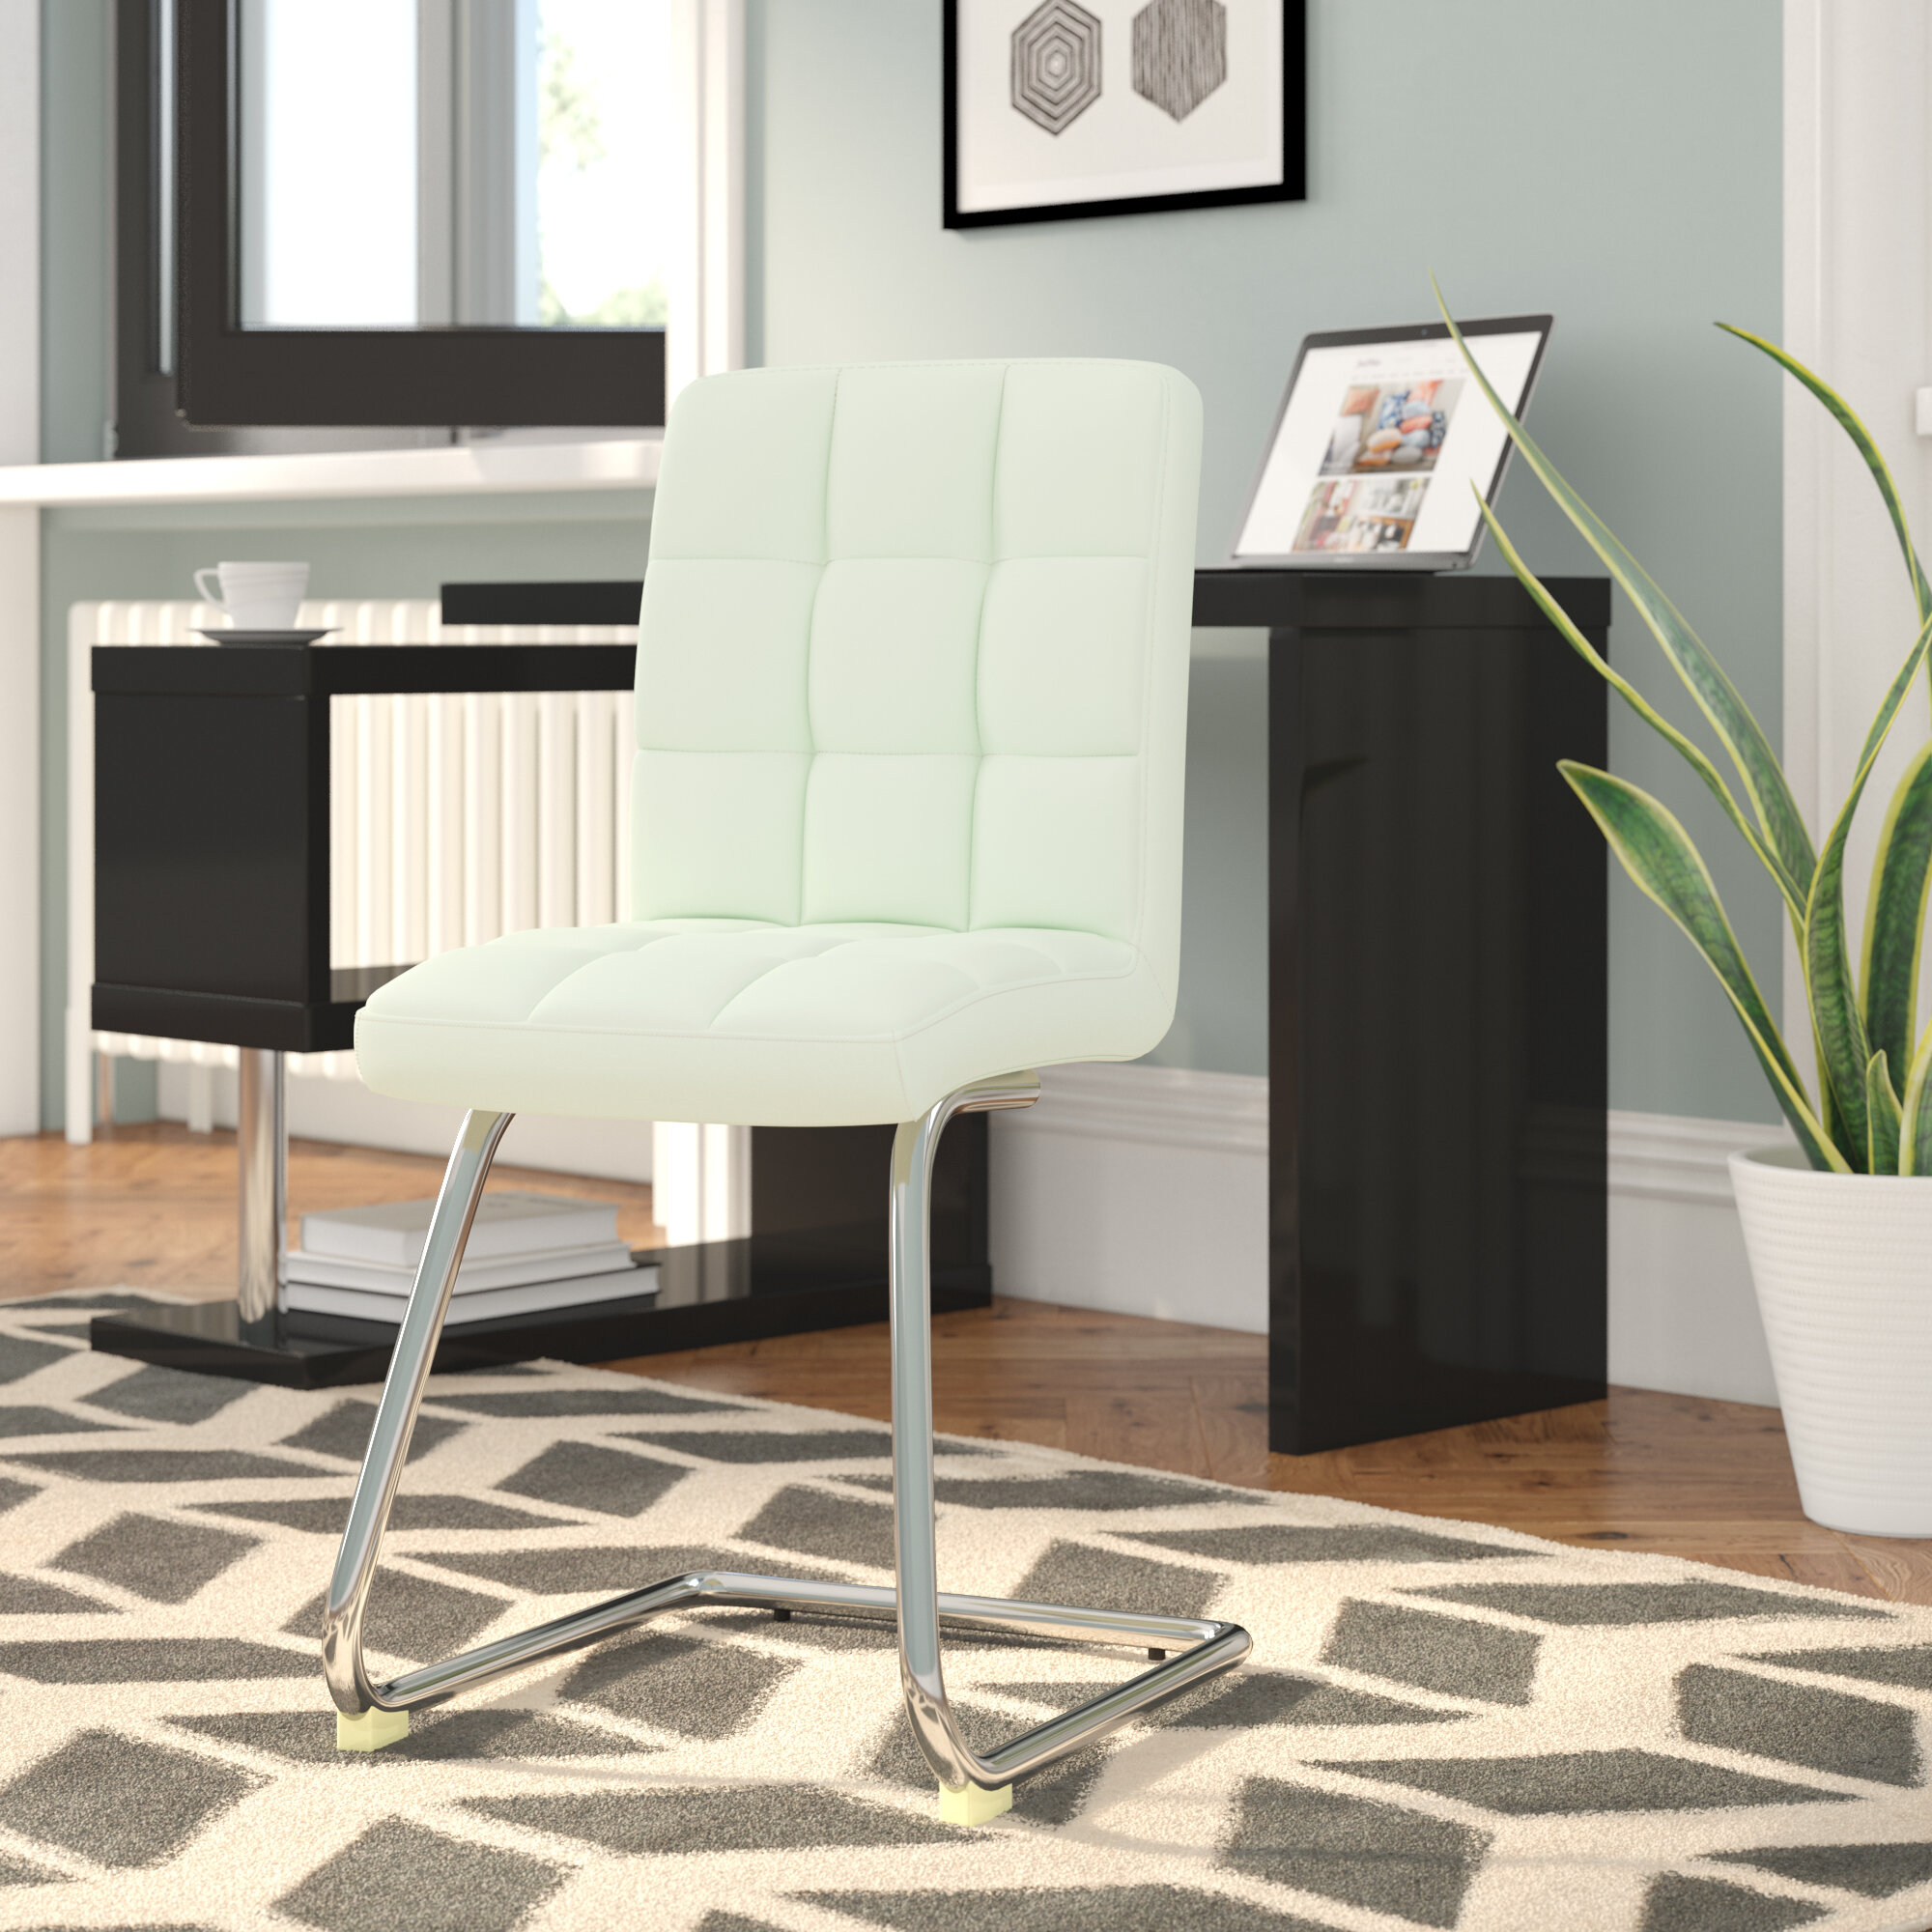 Strange Cuba Boardroom Office Chair Interior Design Ideas Clesiryabchikinfo